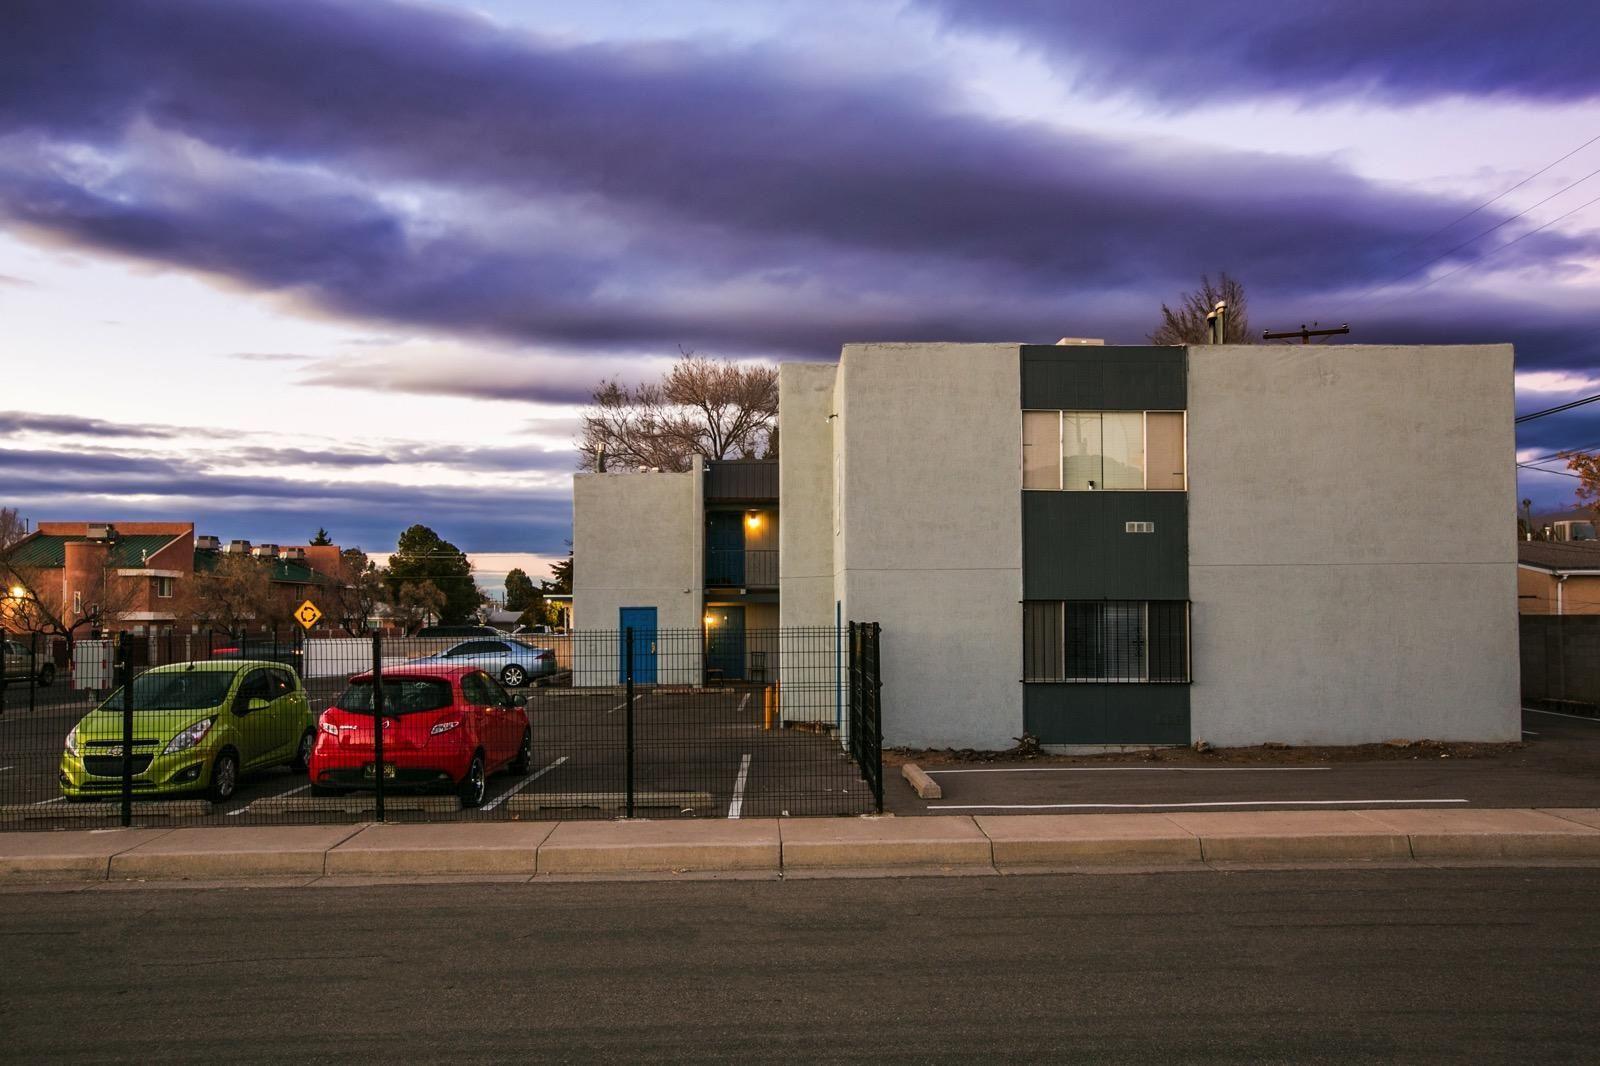 300 La Veta Drive NE, Albuquerque, NM 87108 - MLS#: 986324